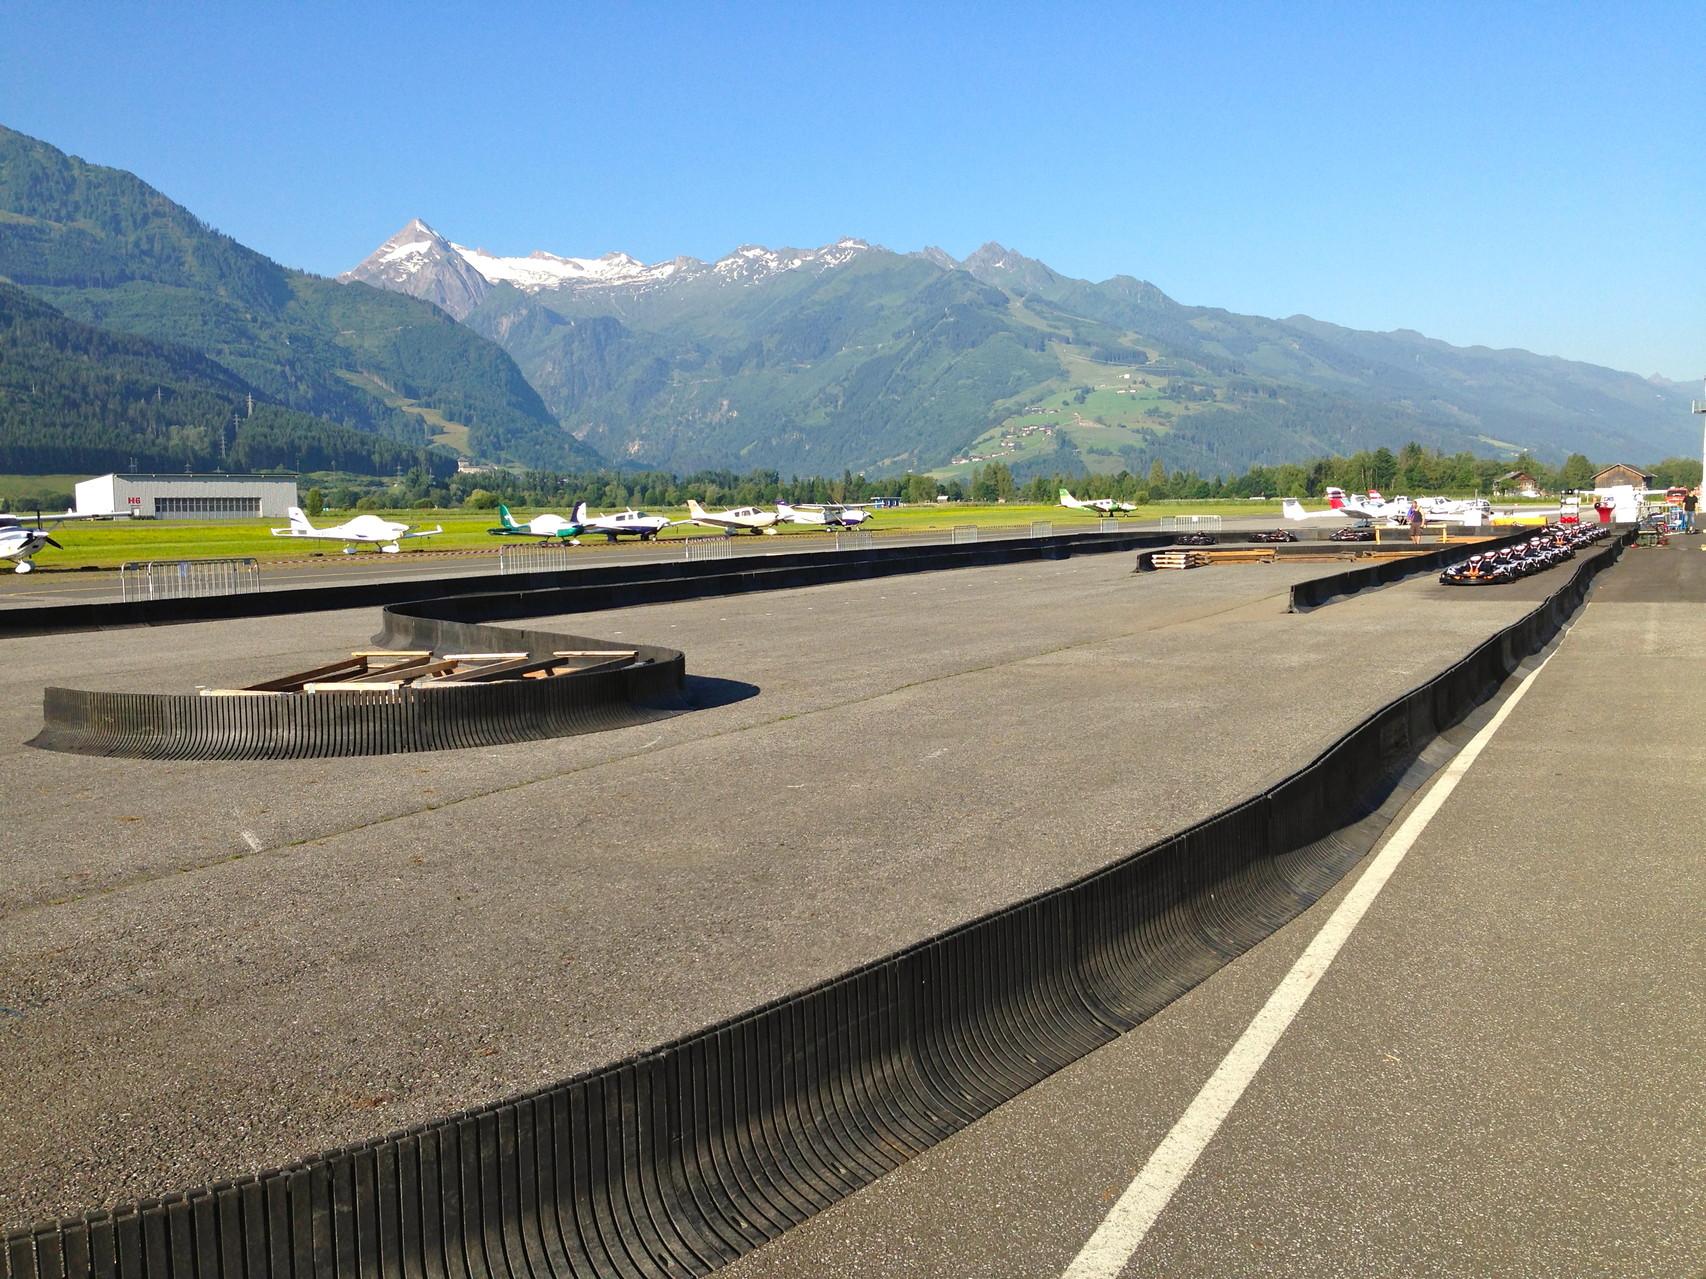 Mobile Rennstrecke Kartbahn Schweiz